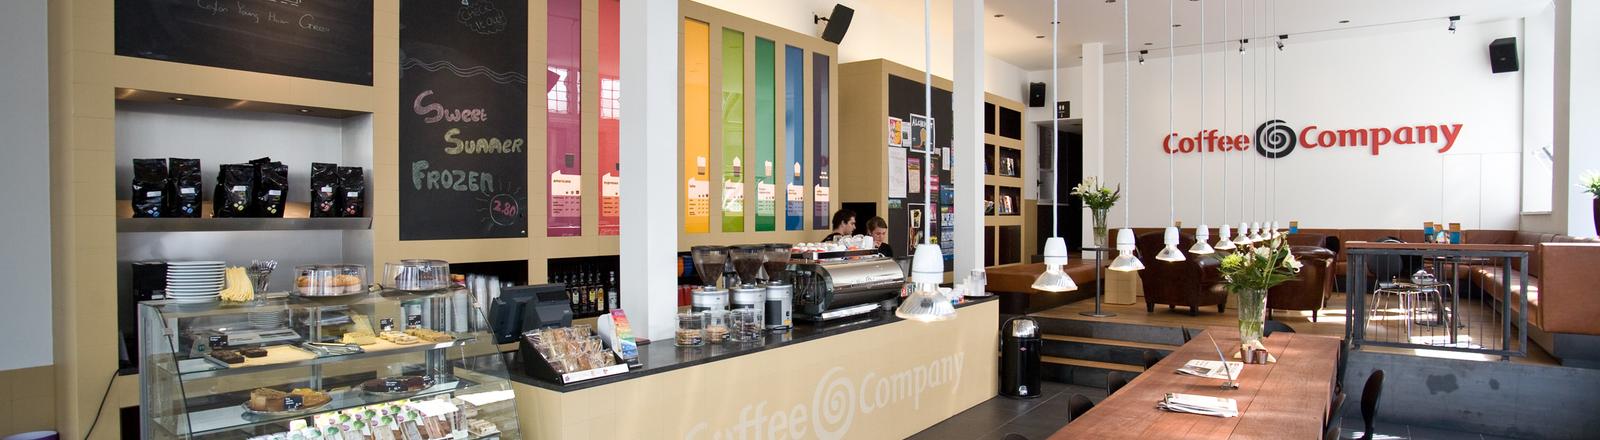 Cc oude ebbinge coffeecompany for Coffee business